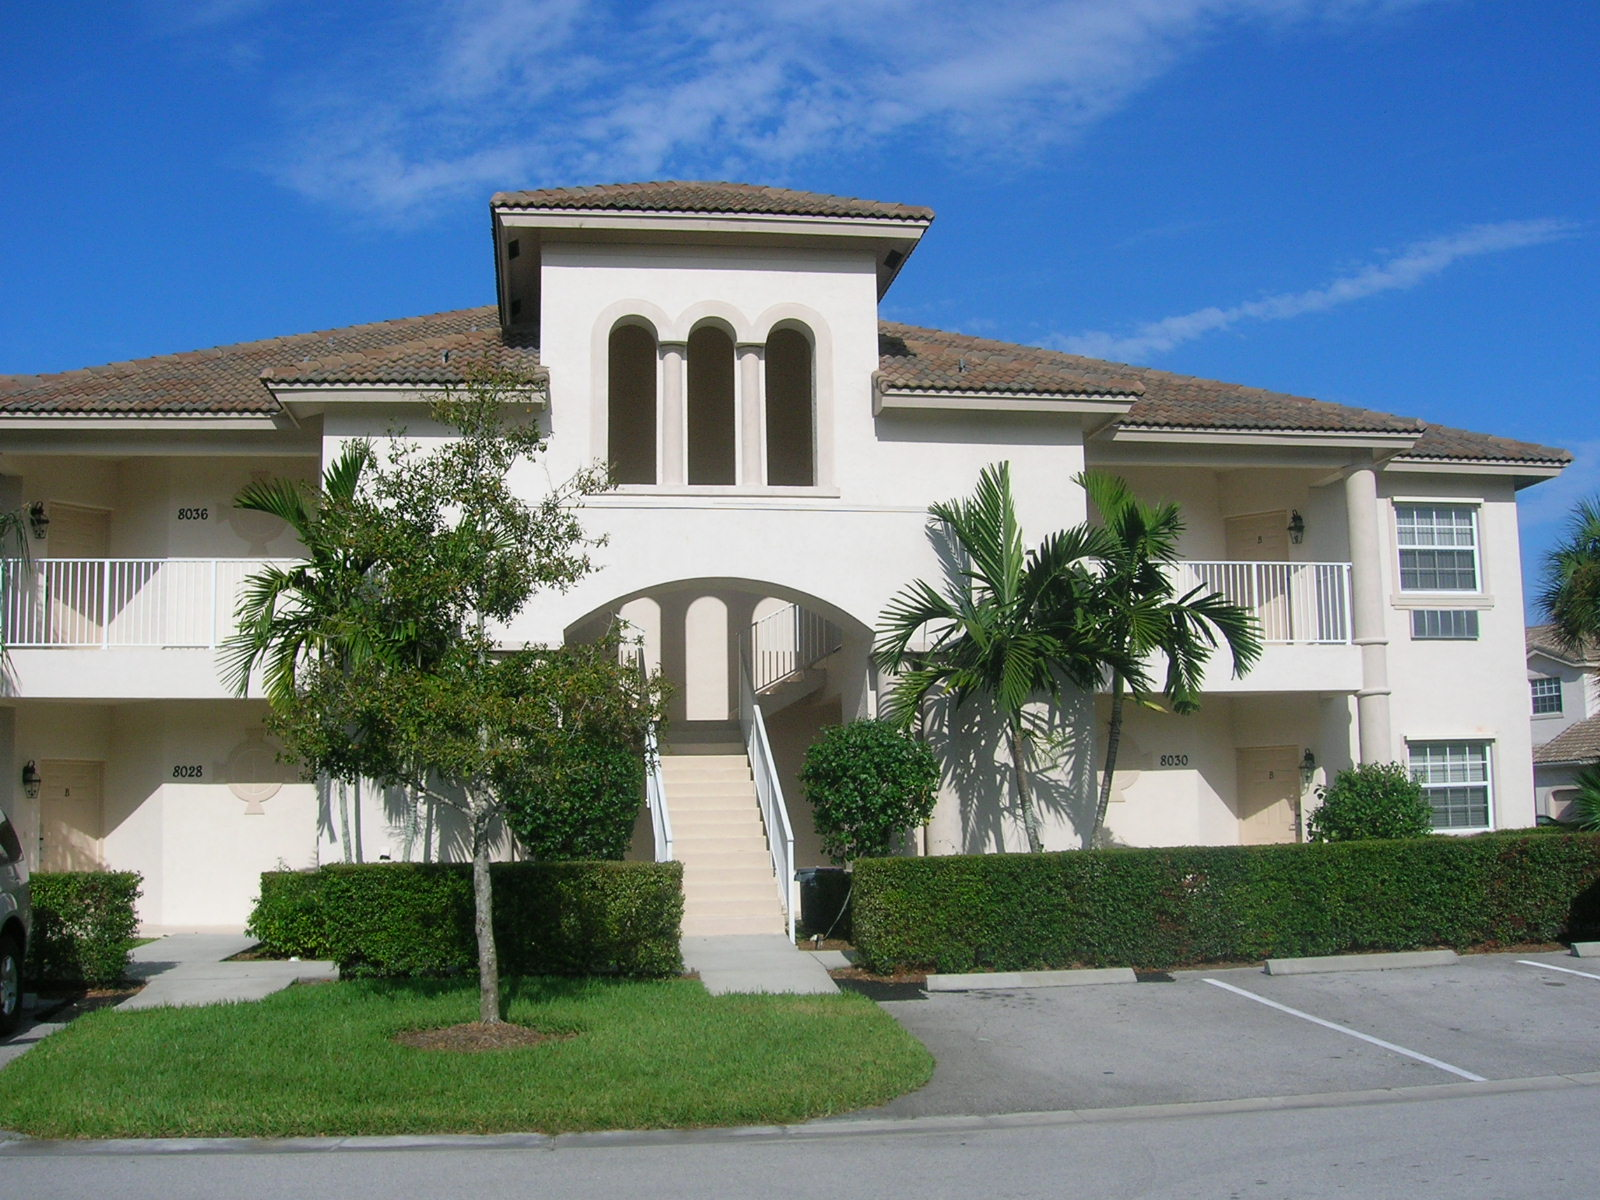 pga village florida real estate, PGA Village Florida Real Estate